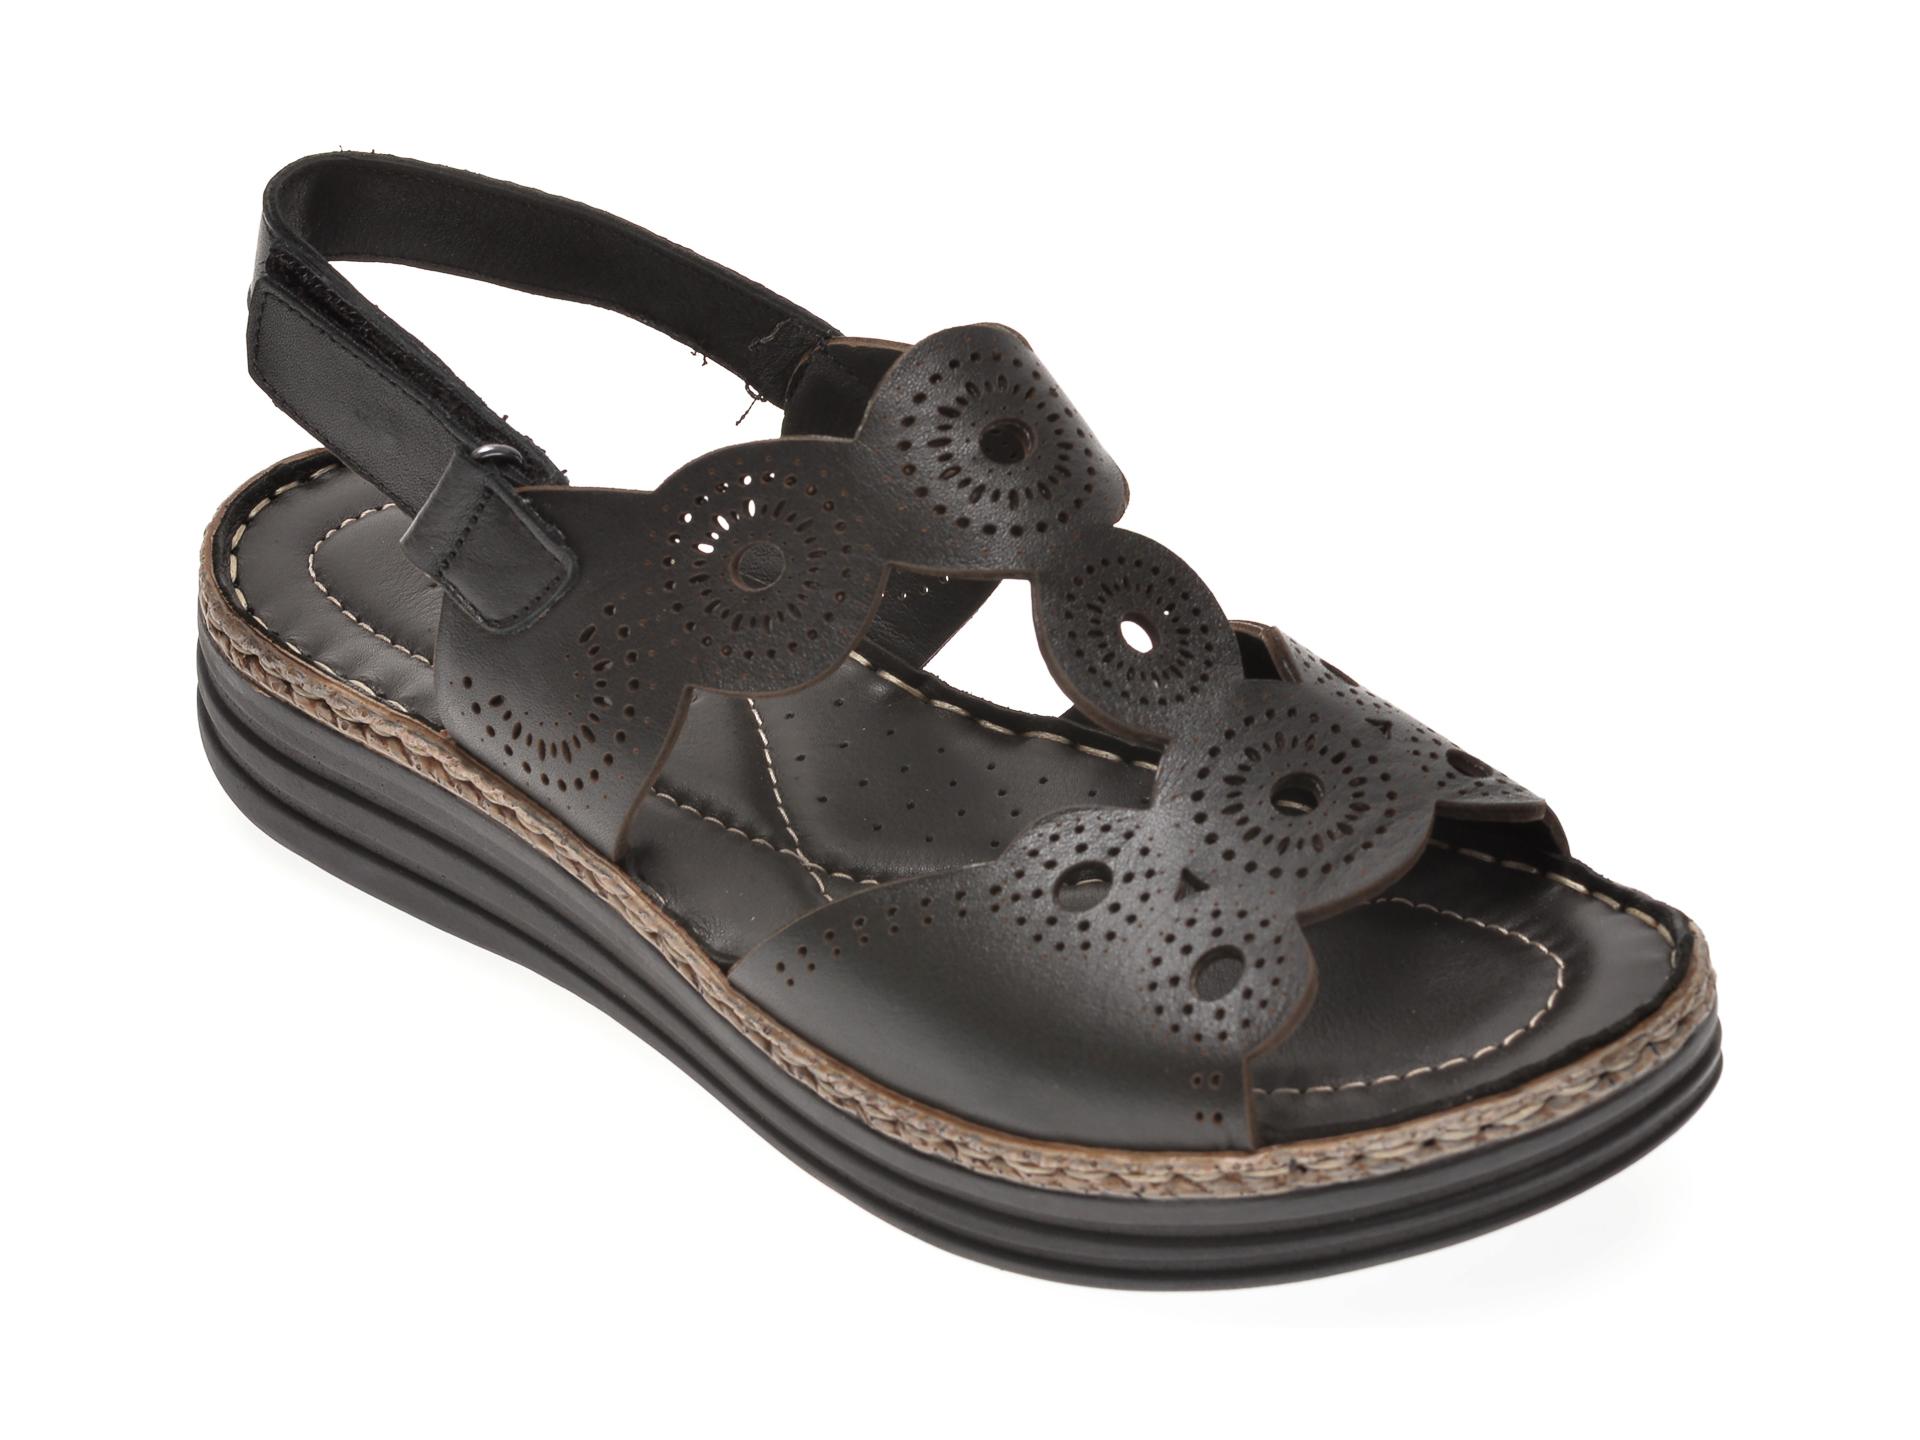 Sandale MARCHA negre, 541, din piele naturala New